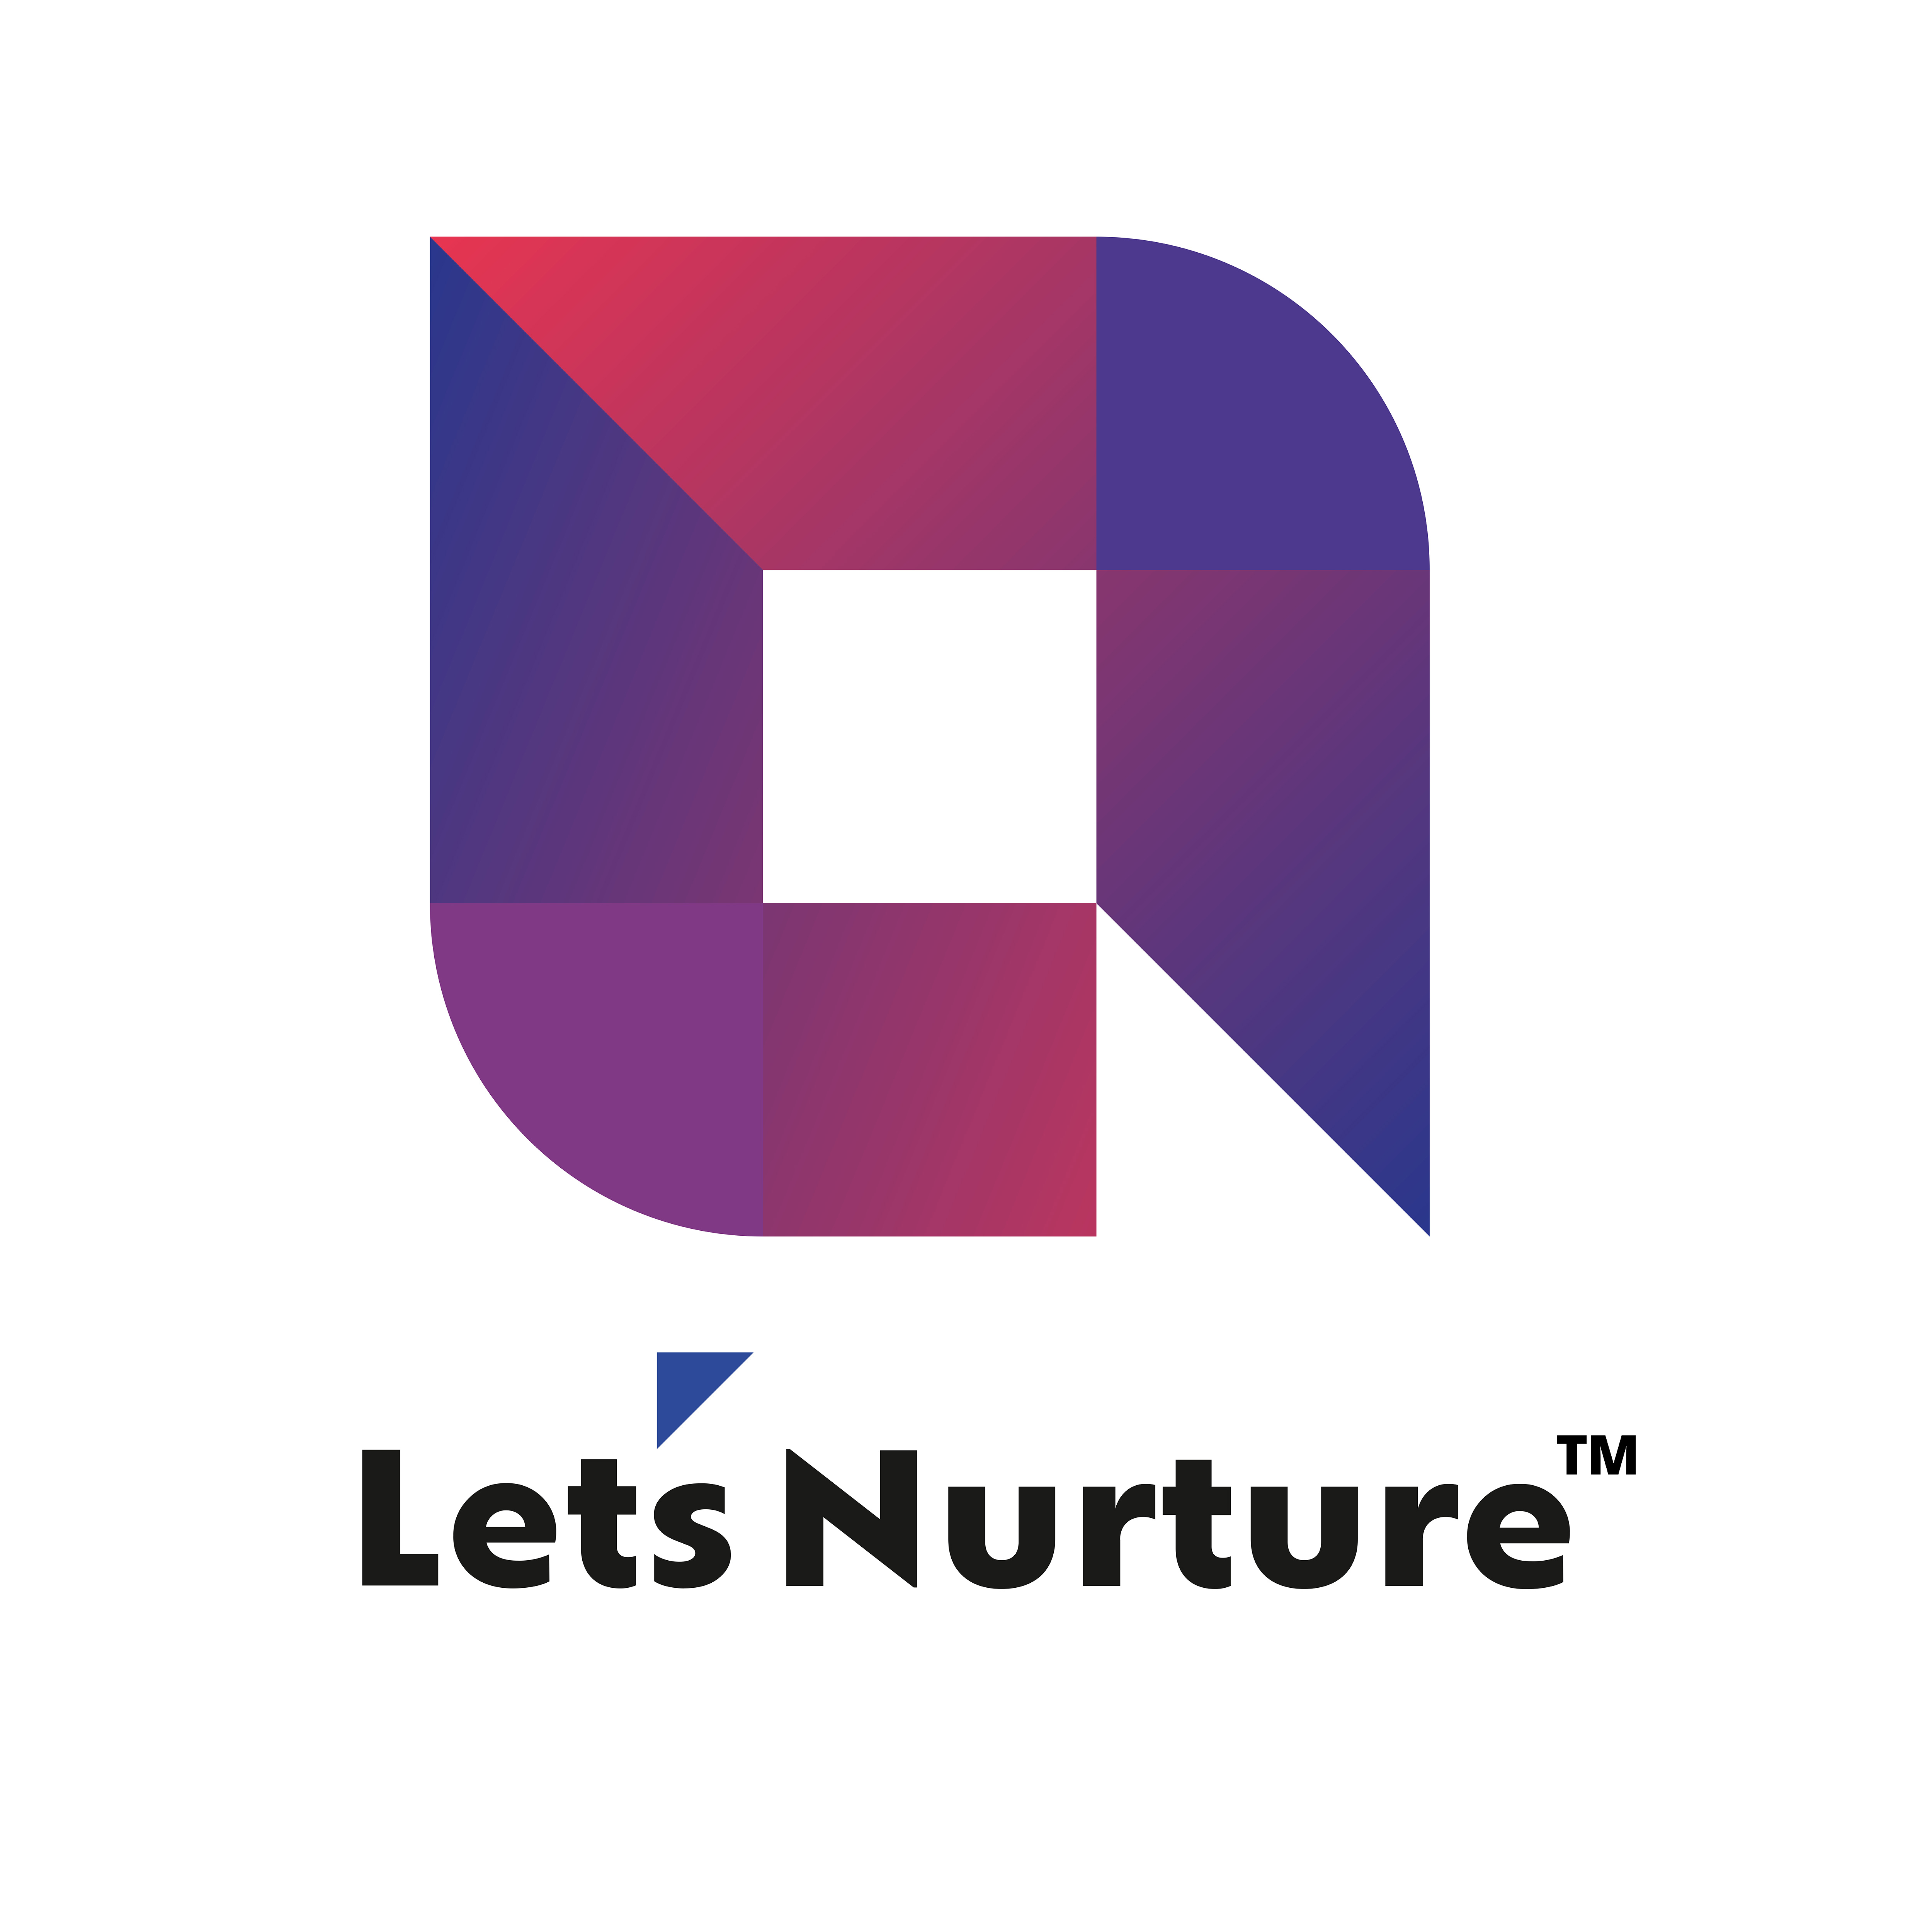 Let's Nurture - An IT Company Nurturing Ideas into Reality